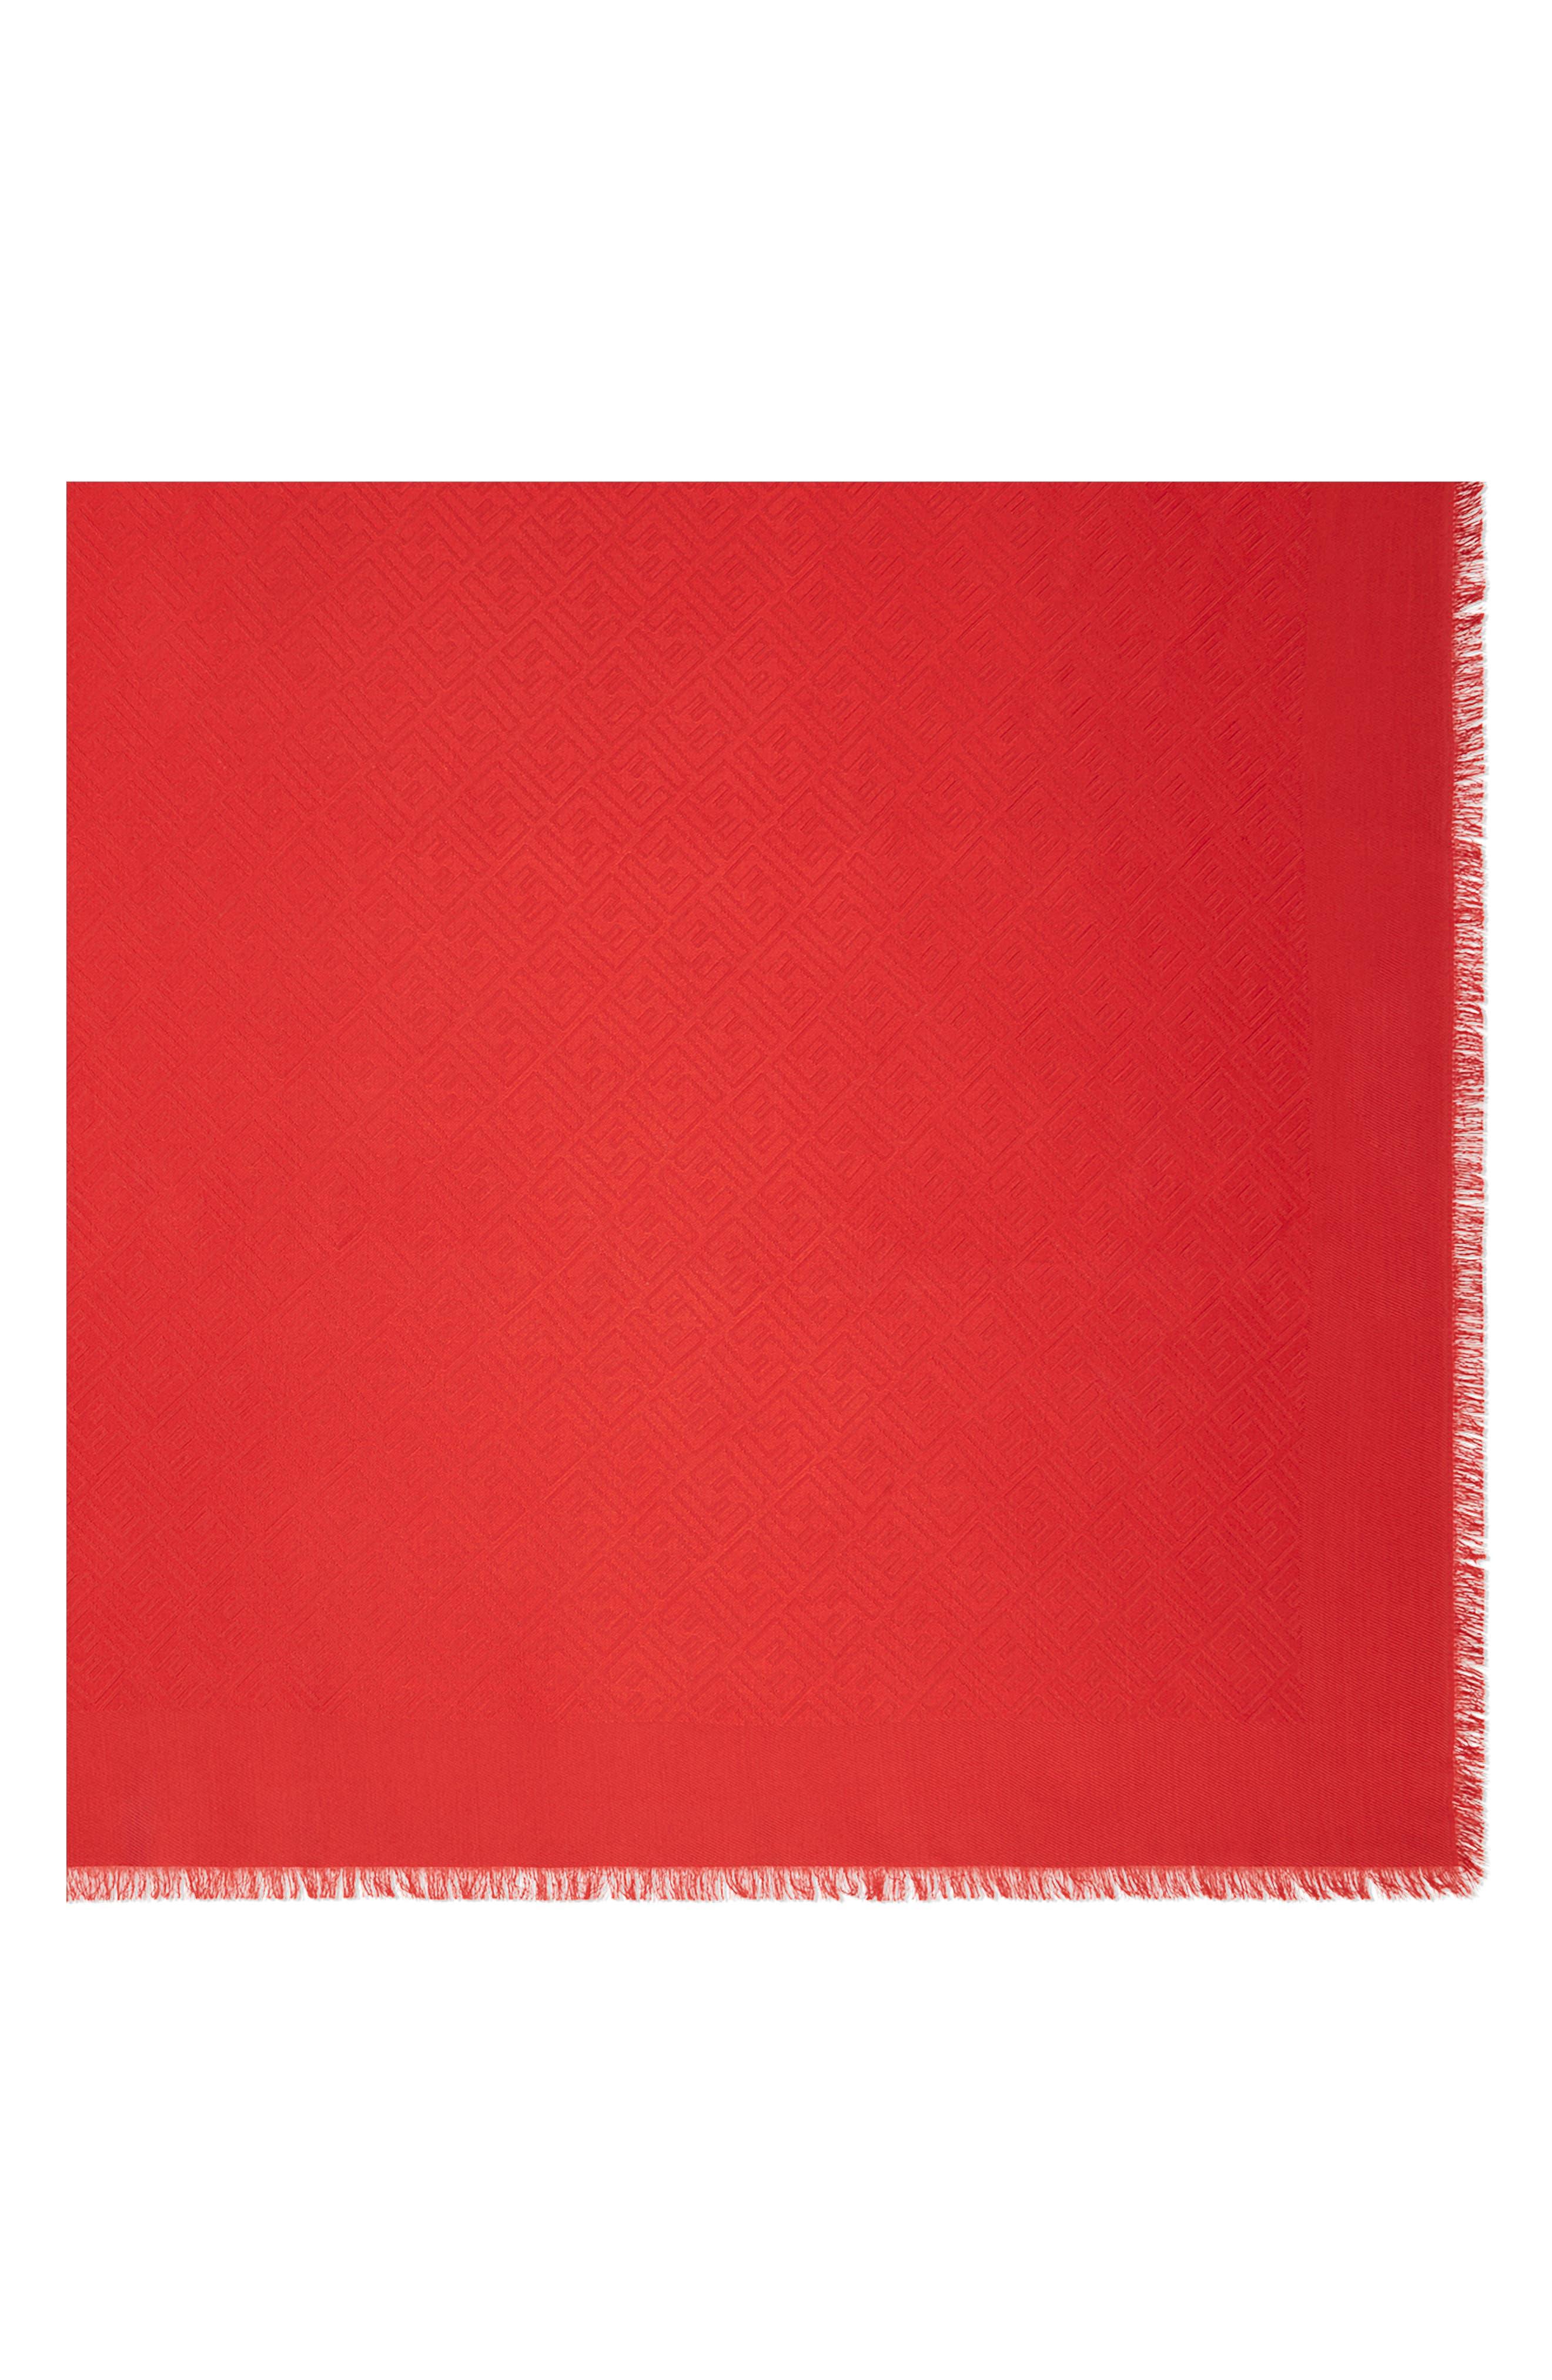 FENDI, Logo Silk & Wool Scarf, Main thumbnail 1, color, DARK RED